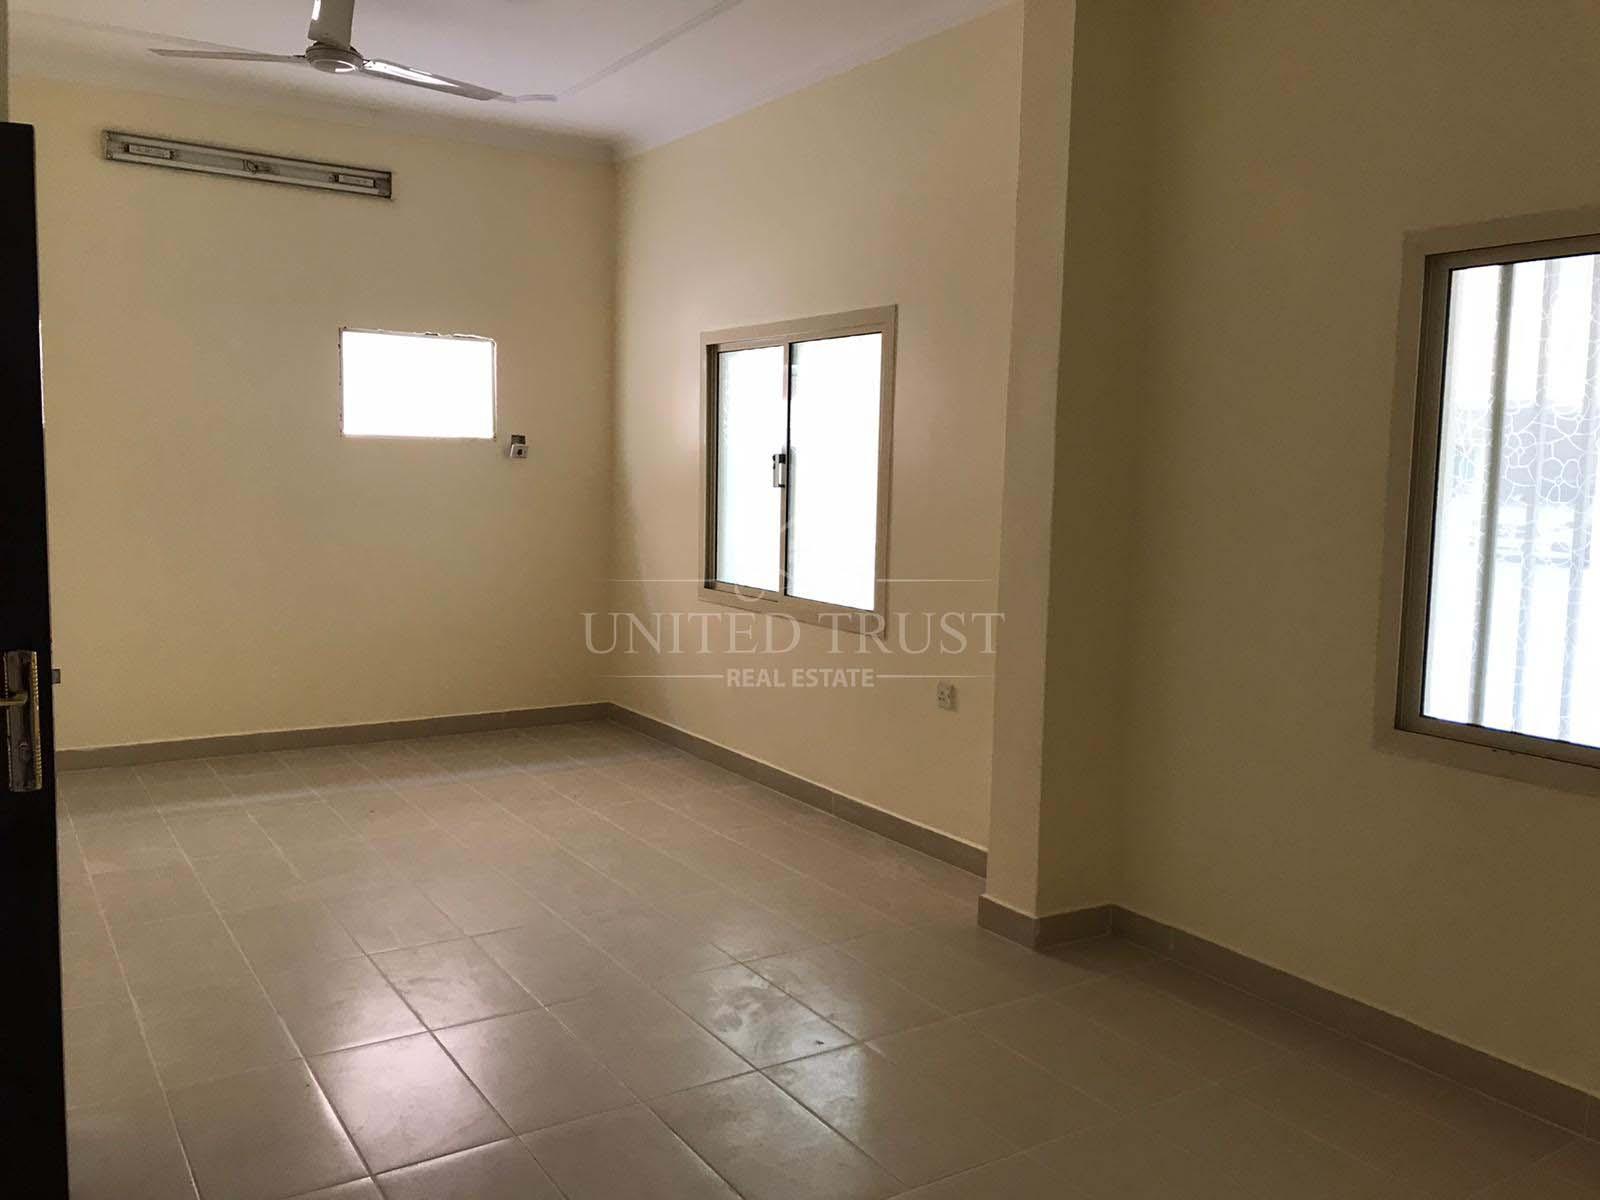 For rent a 3 bedrooms Flat in Tubli Ref: TUB-AZ-027